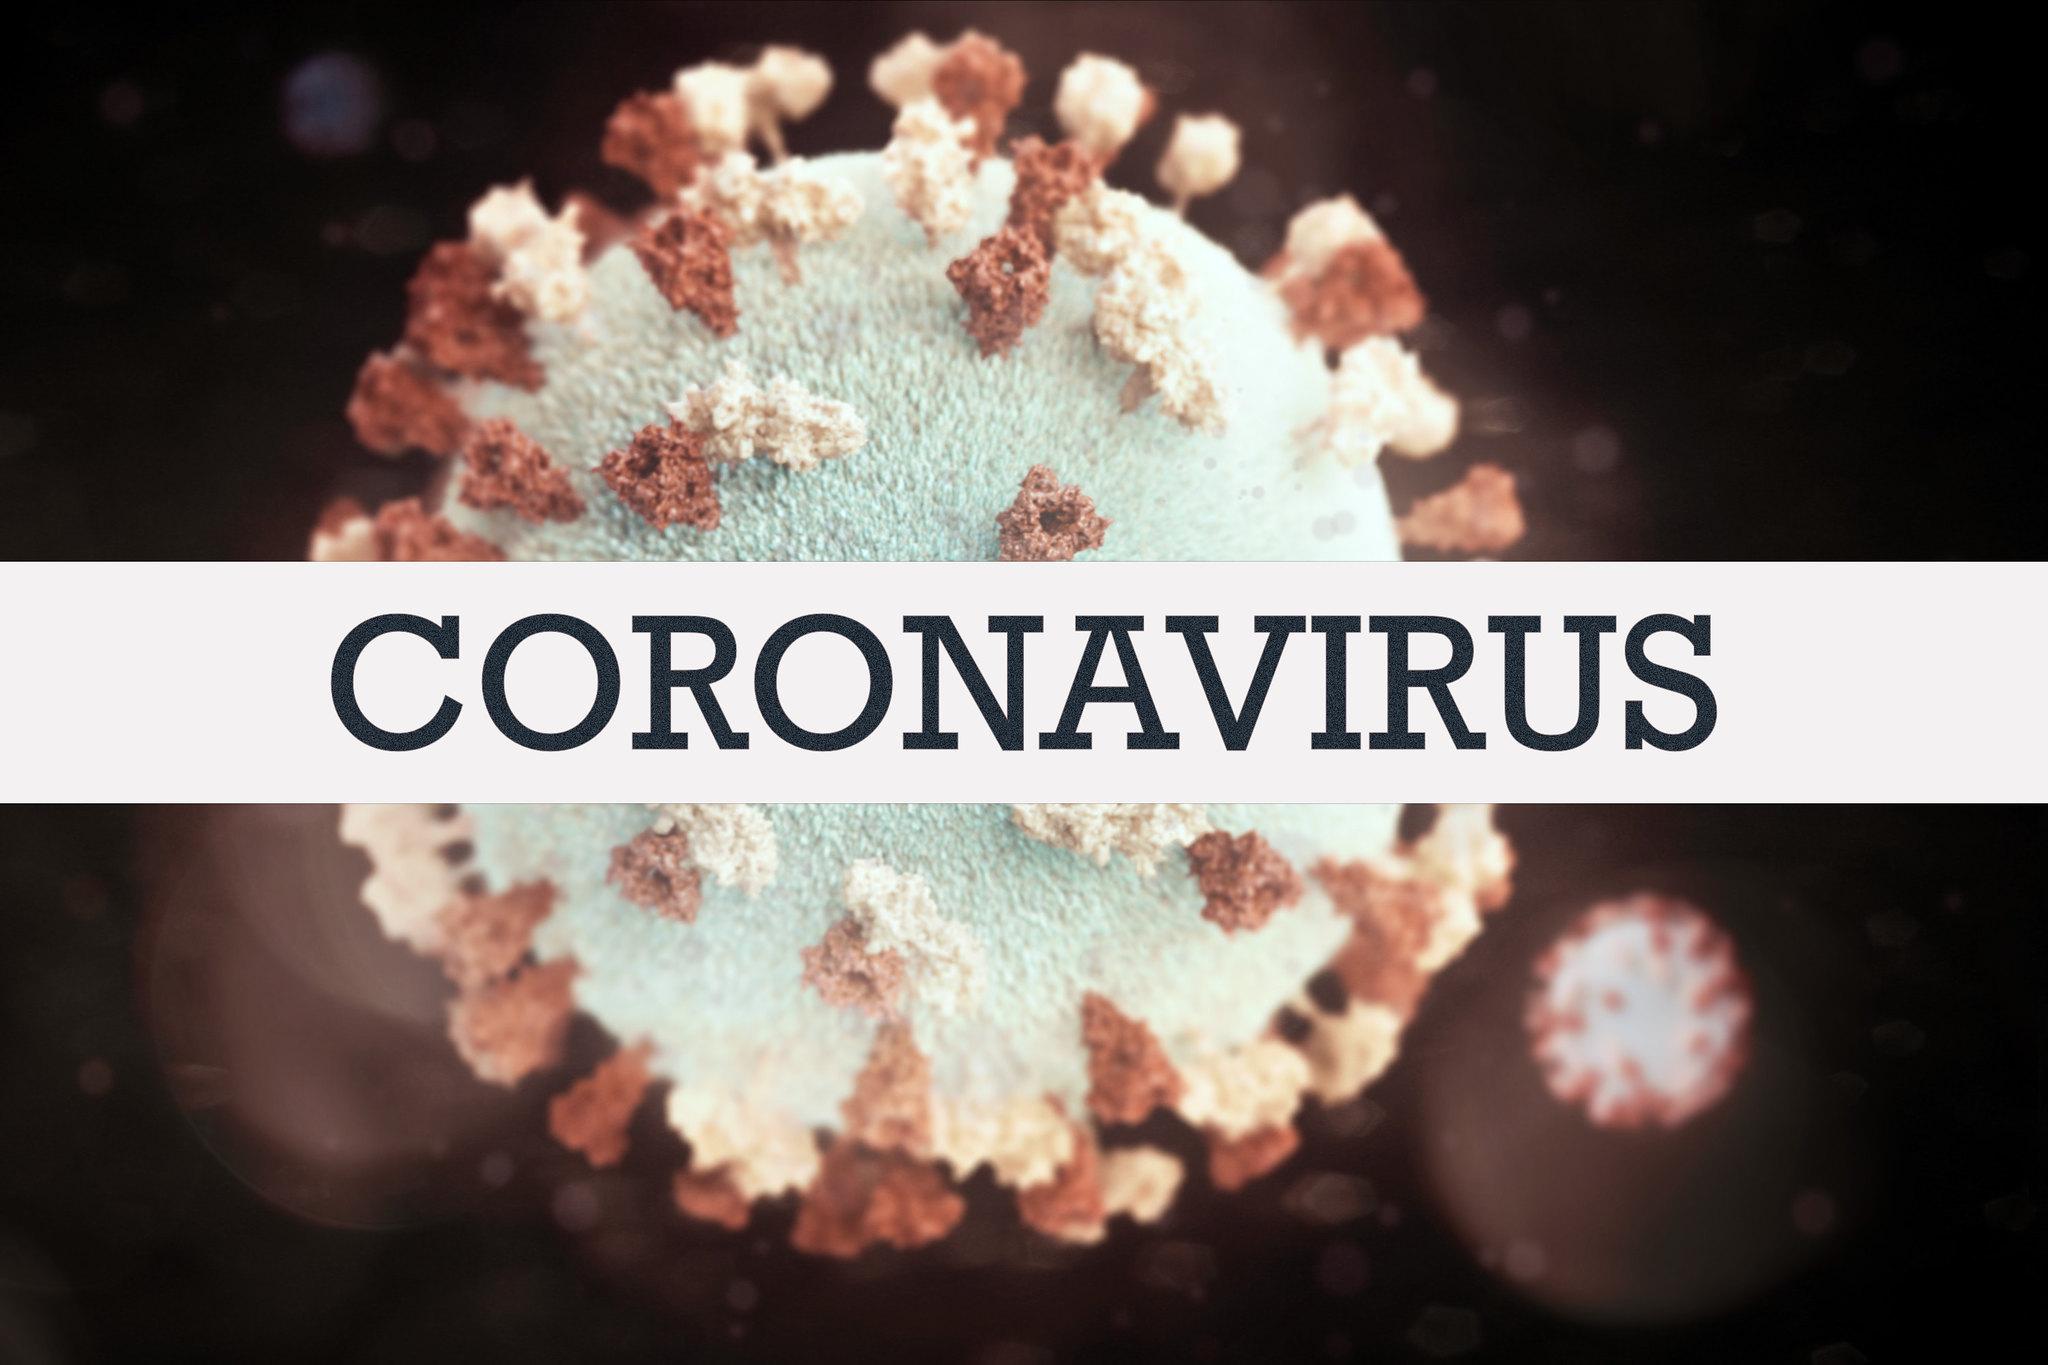 Coronavirus crisis hits Native America; believers spread hope